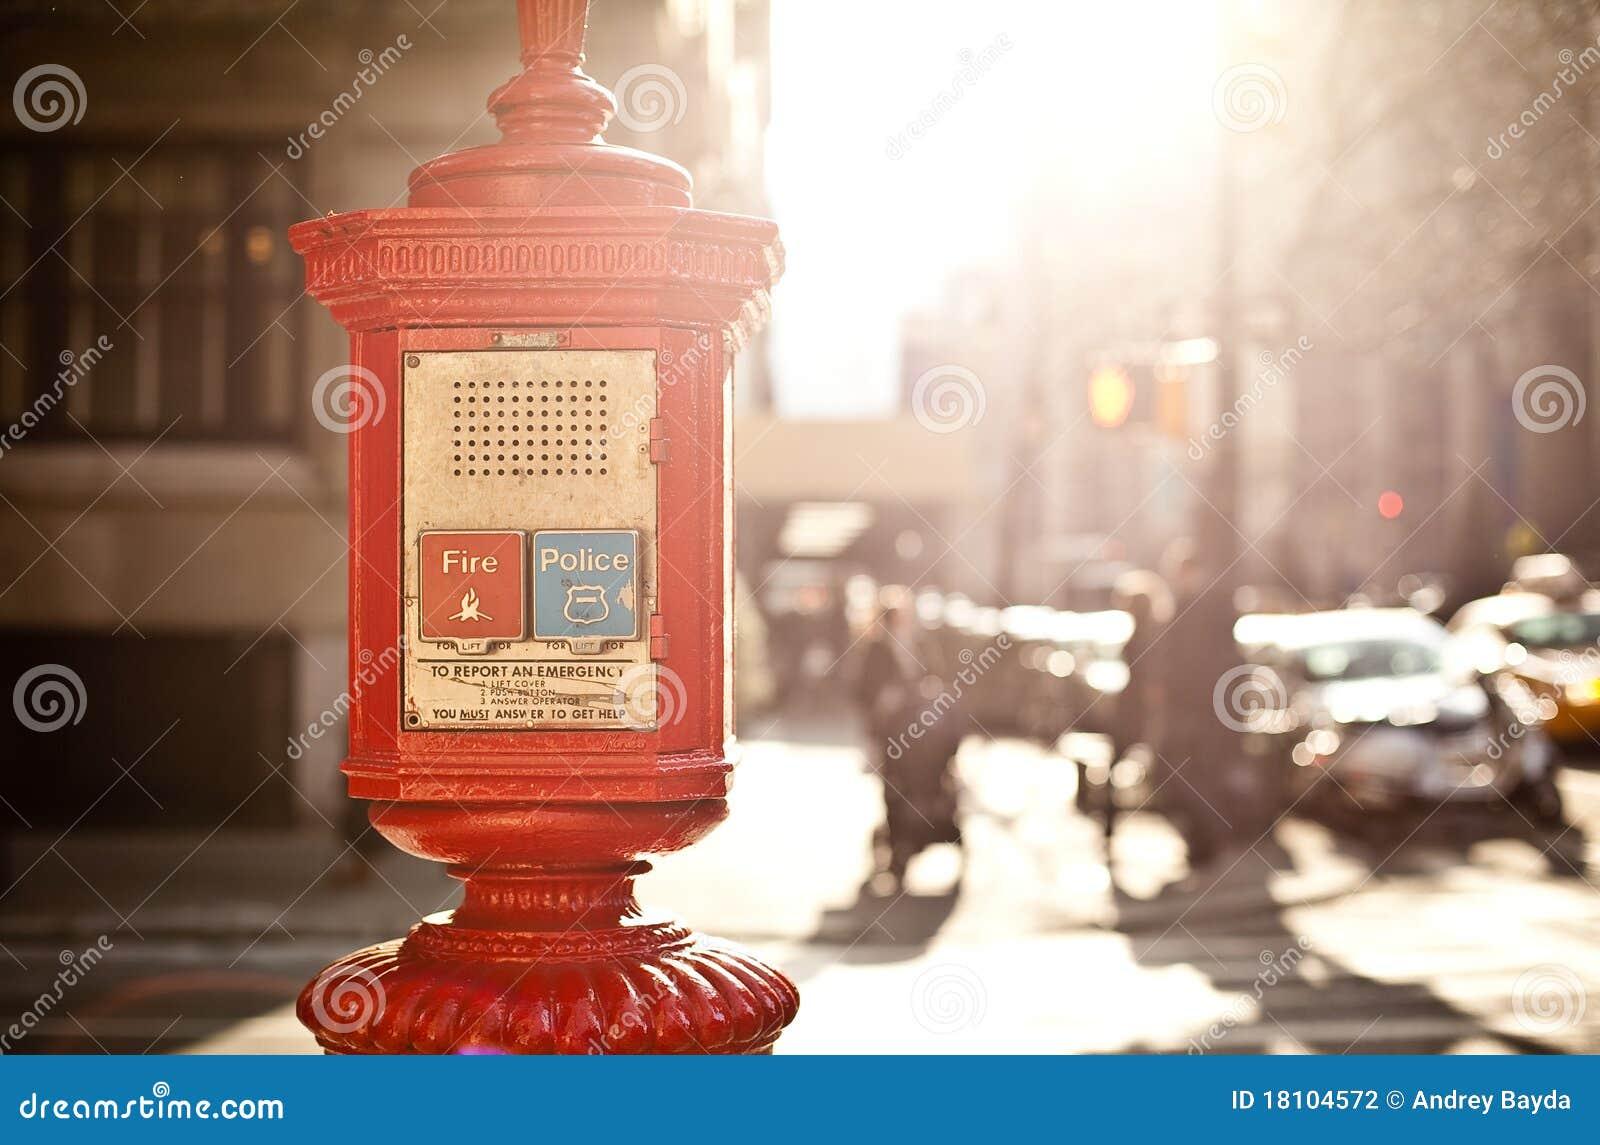 Emergency box in New York